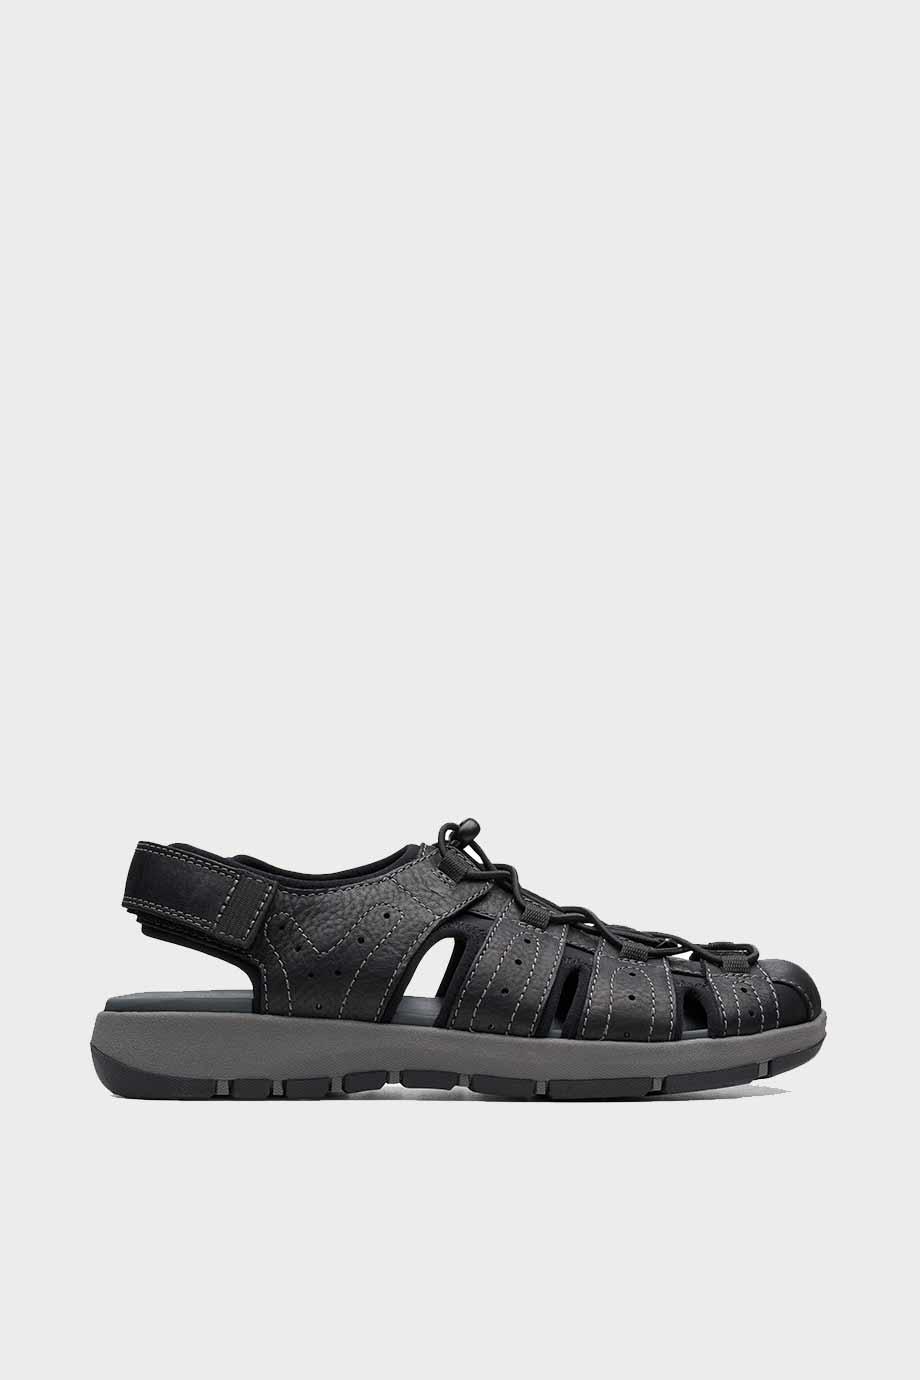 spiridoula metheniti shoes xalkida p Brixby Cove clarks black leather 1